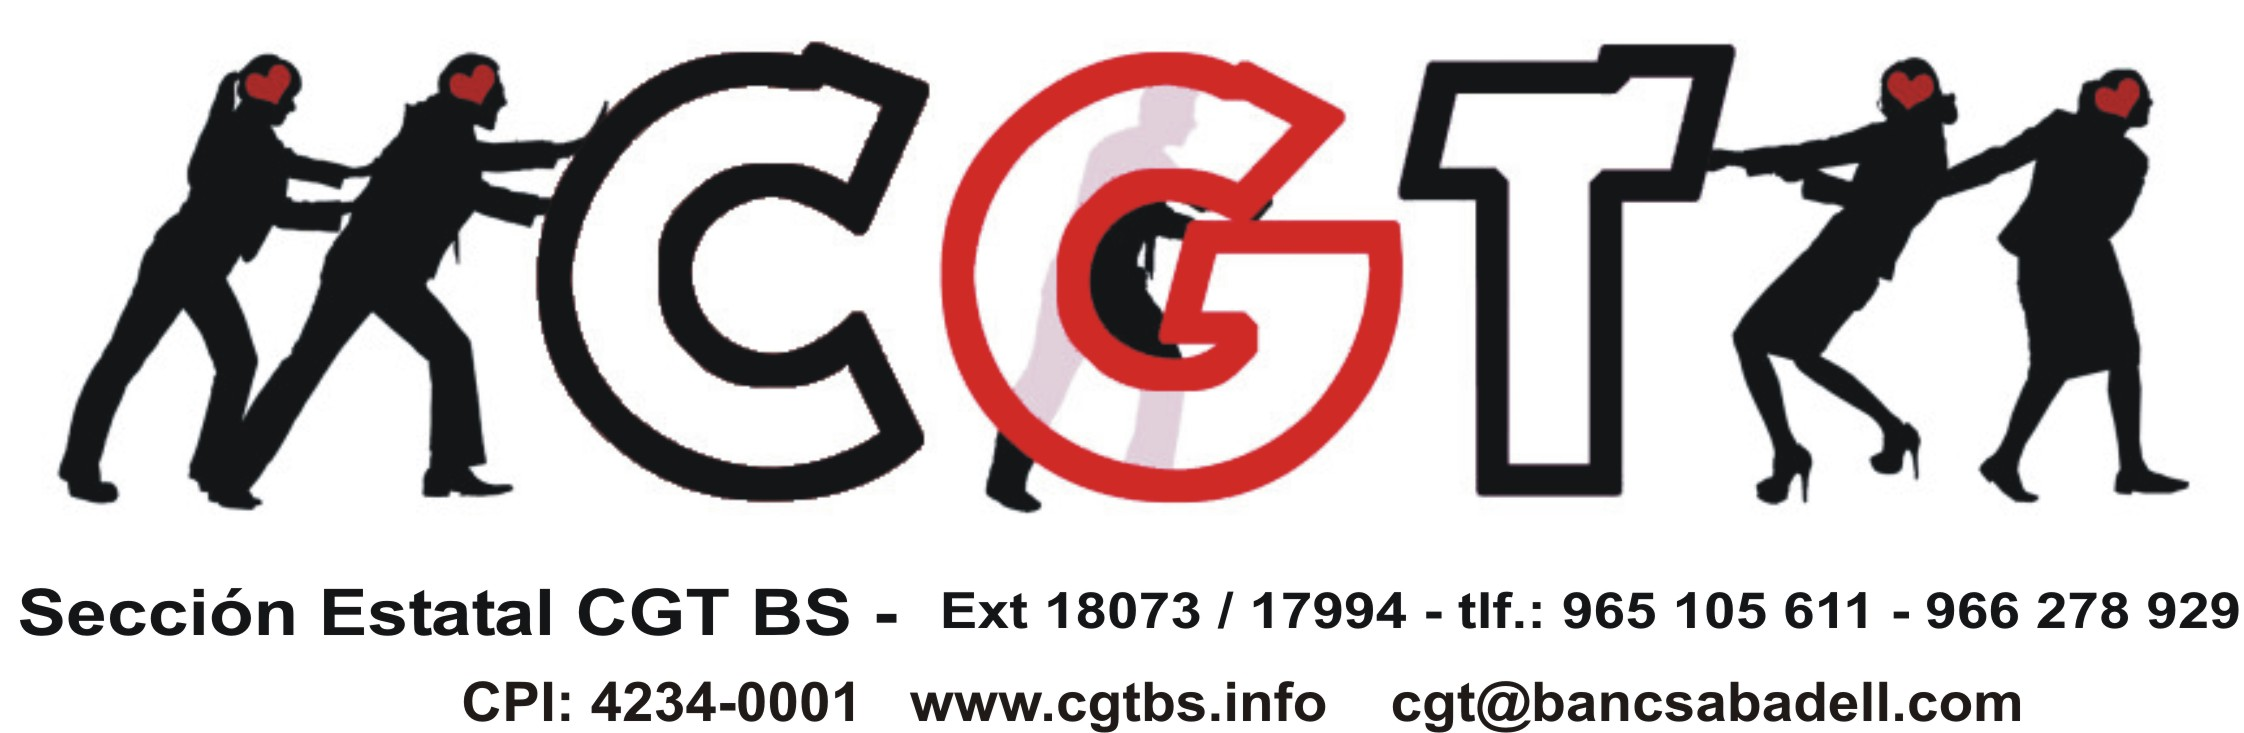 logo pie circular cgtbs